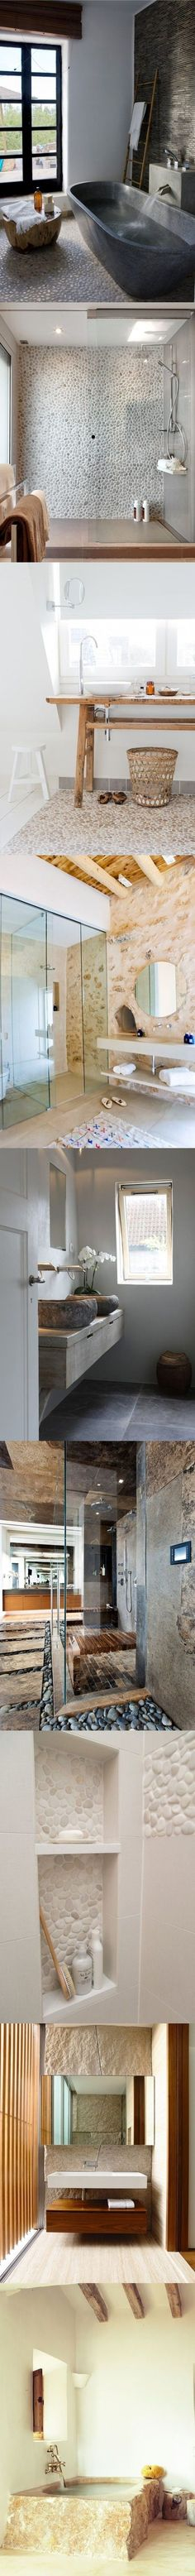 Baños de piedra / http://www.estiloydeco.com/